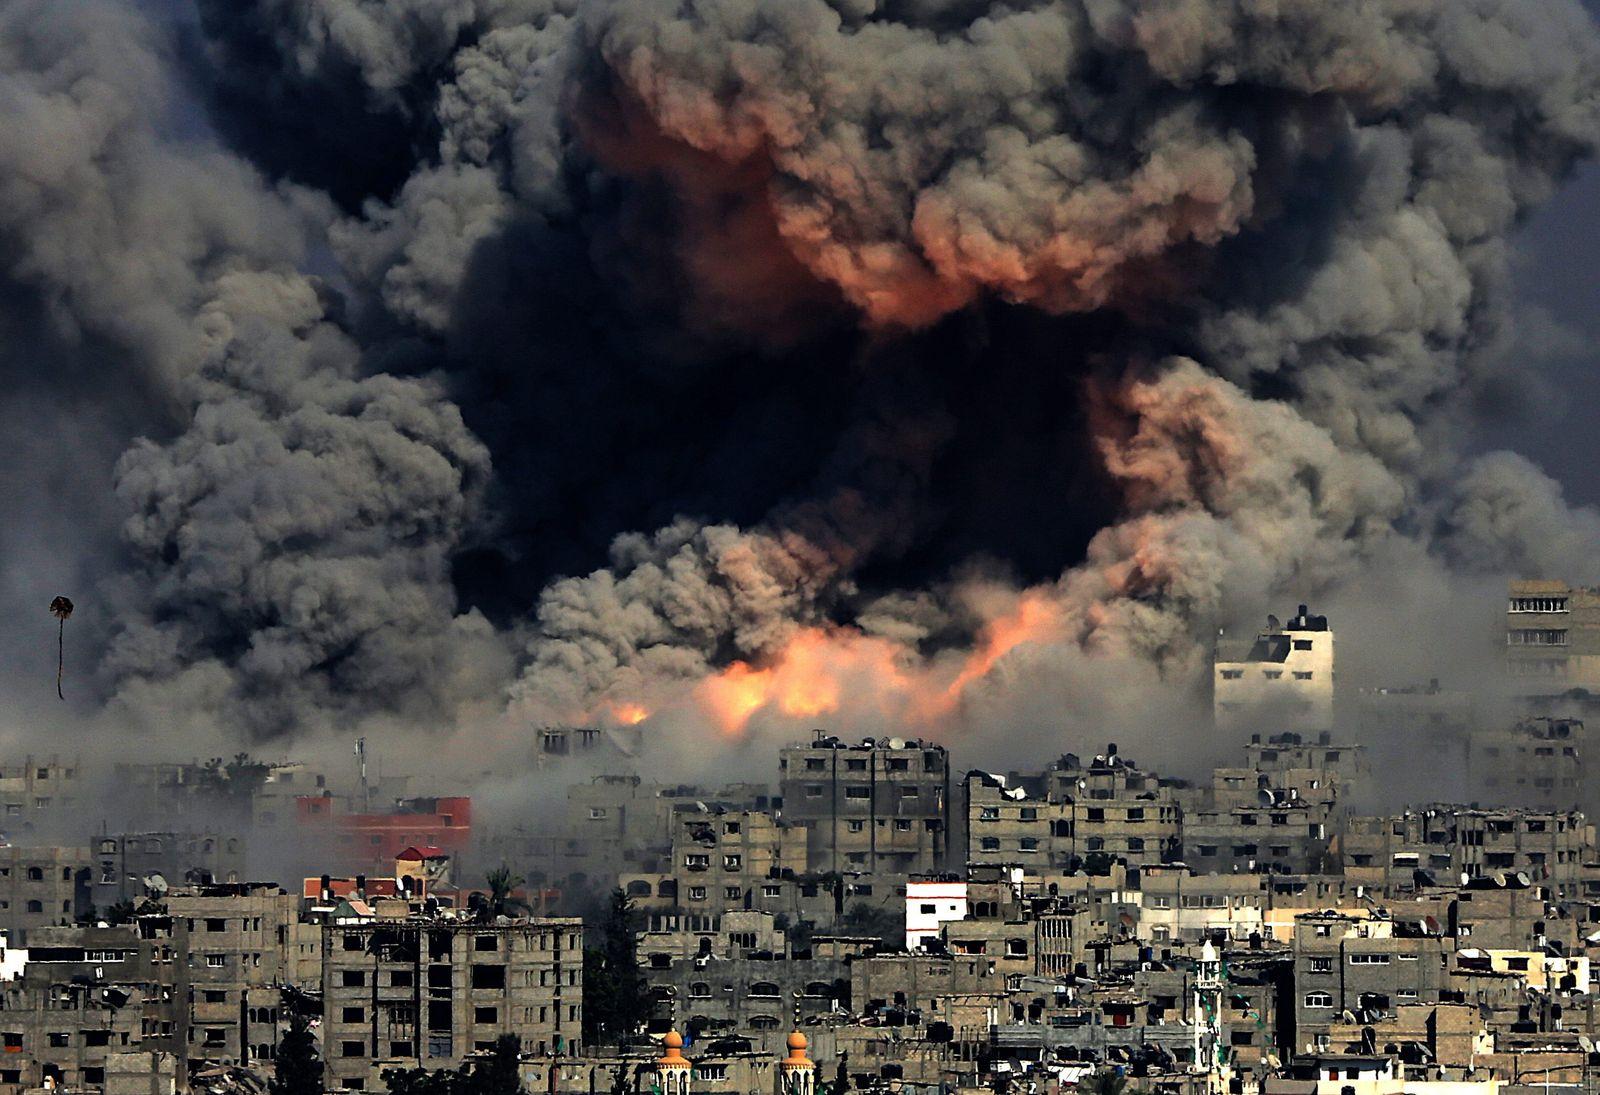 Jahresrückblick 2014 - Israel/Gaza Konflikt